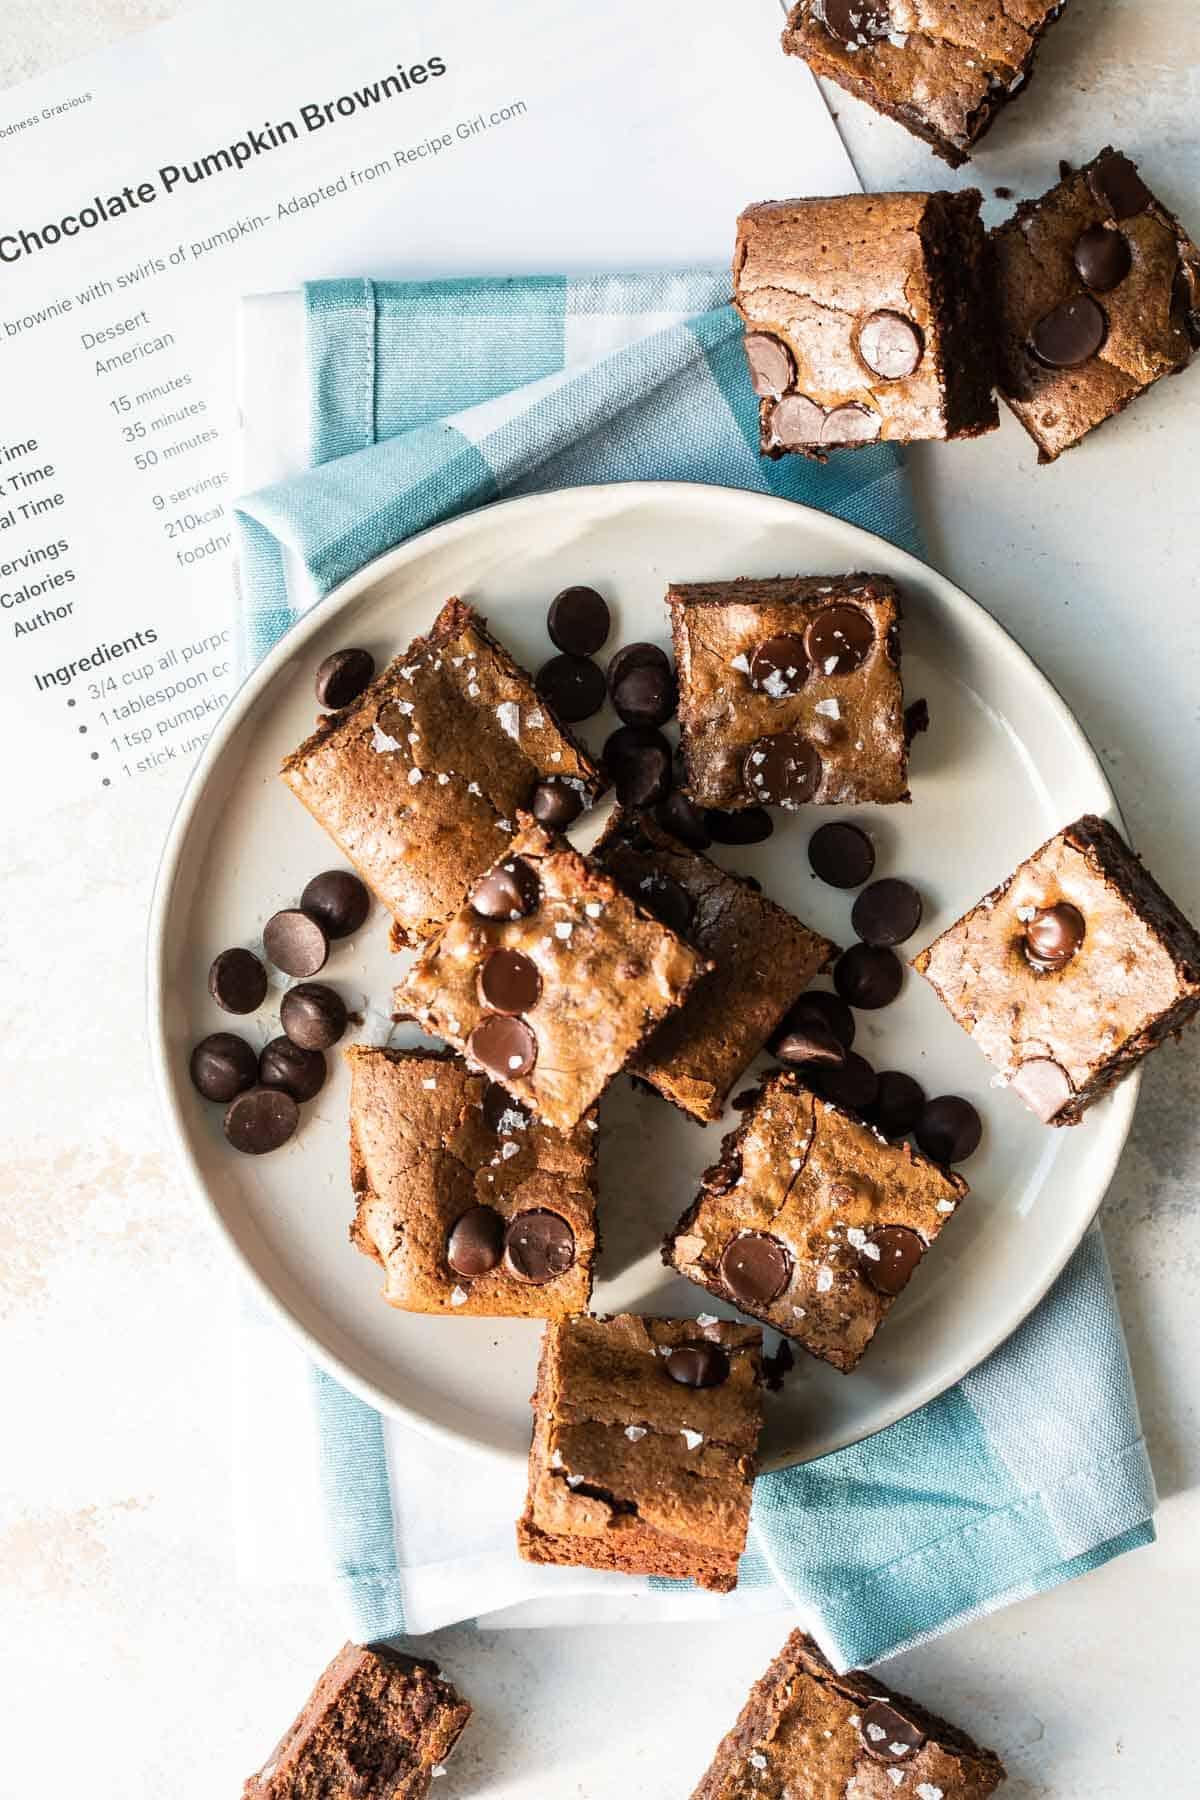 chocolate pumpkin brownies on a plate